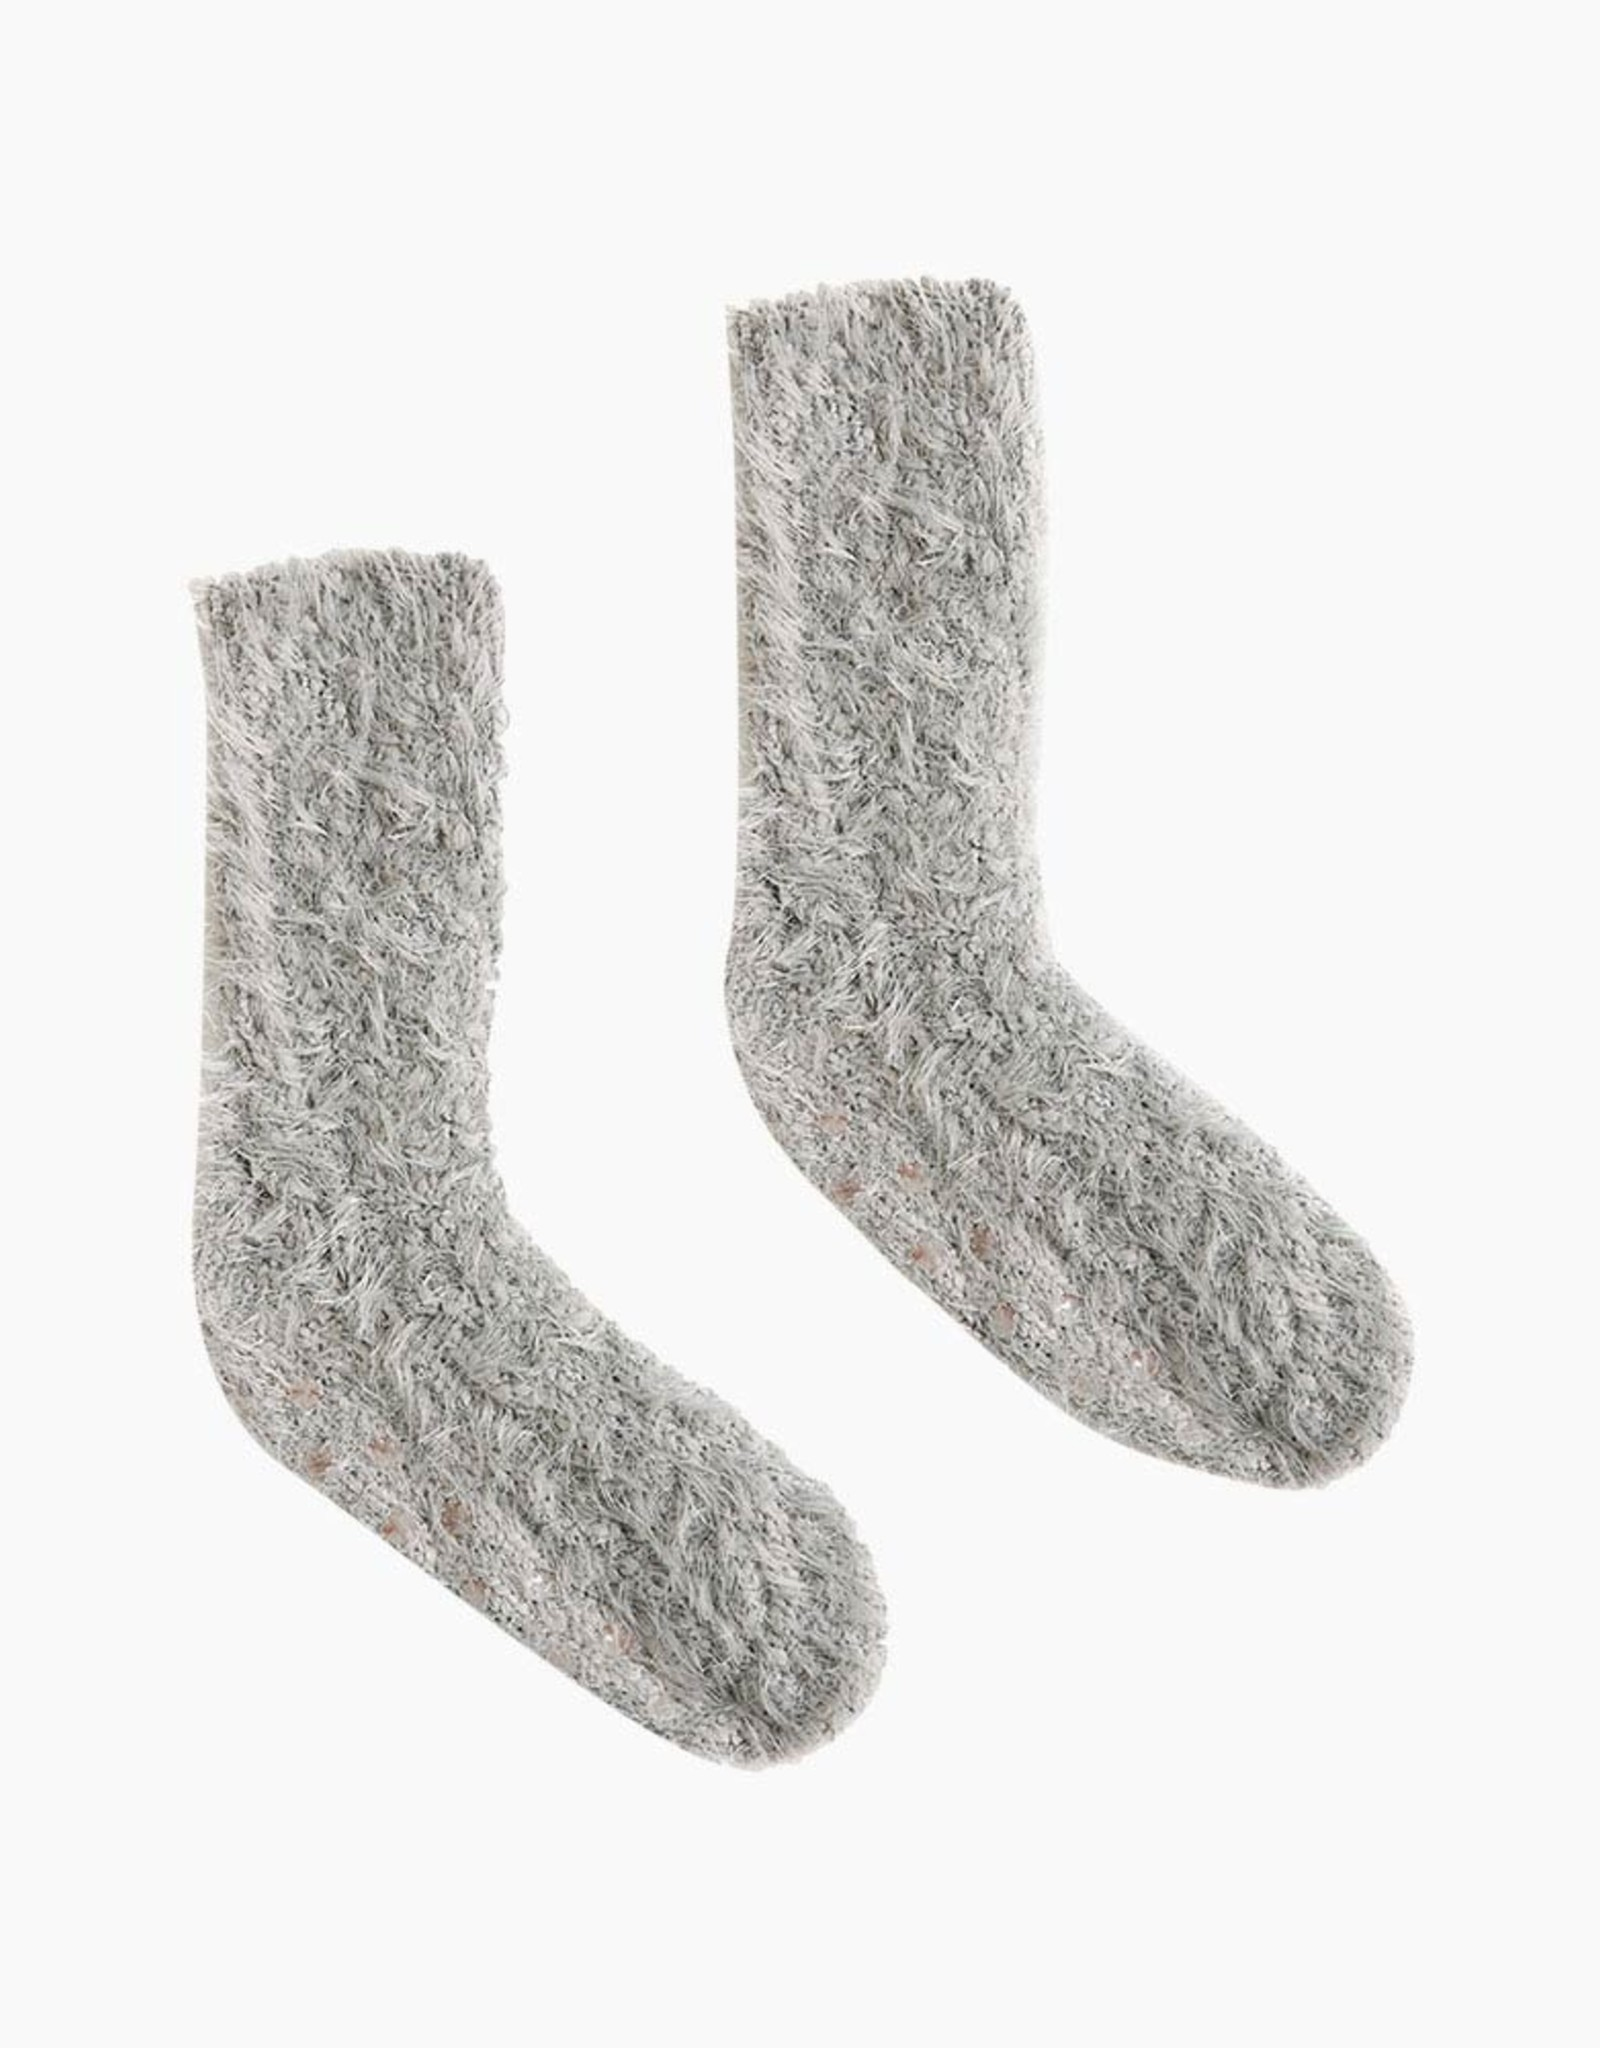 Demdaco The Giving Socks-Taupe